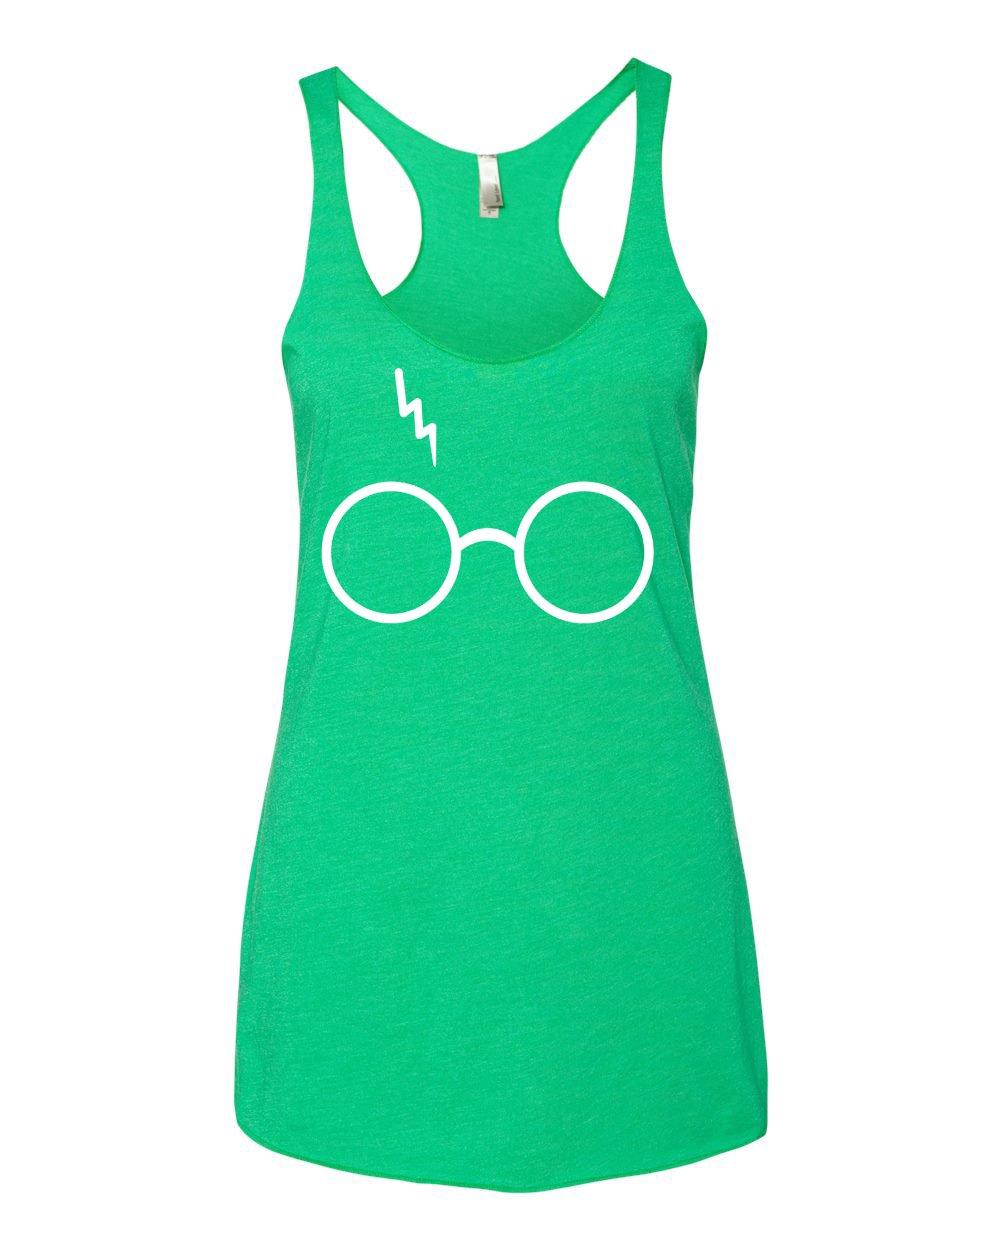 Wild Bobby Harry Potter Glasses Scar Premium Tri-Blend Racerback Women's Tank Top (Green Envy, Small)